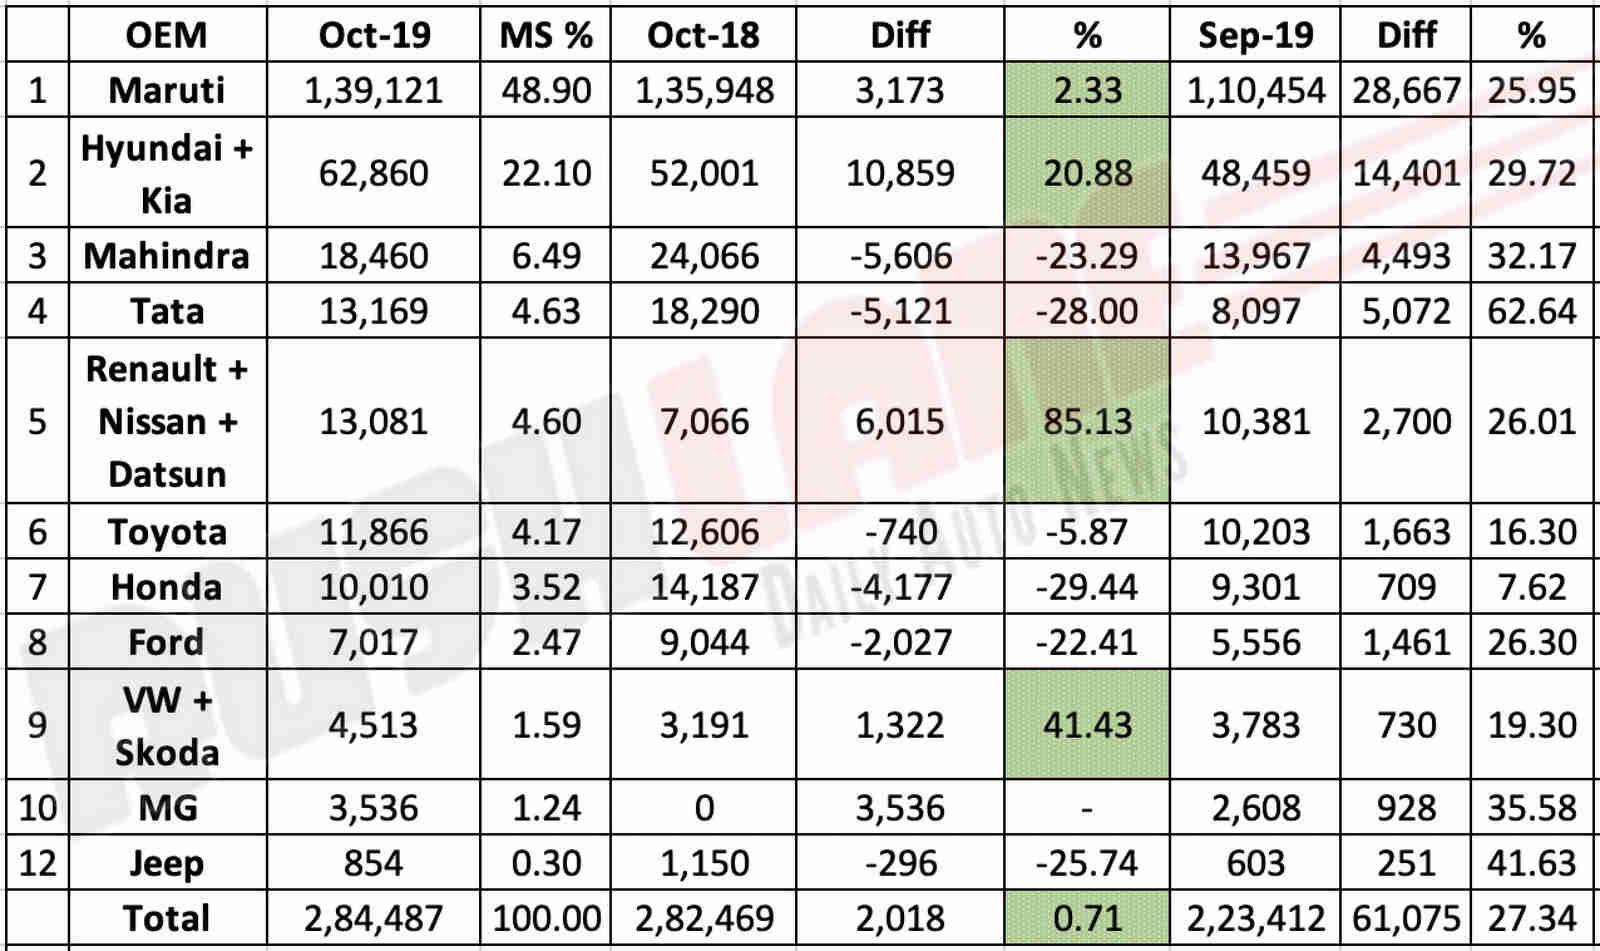 Car market share Oct 2019